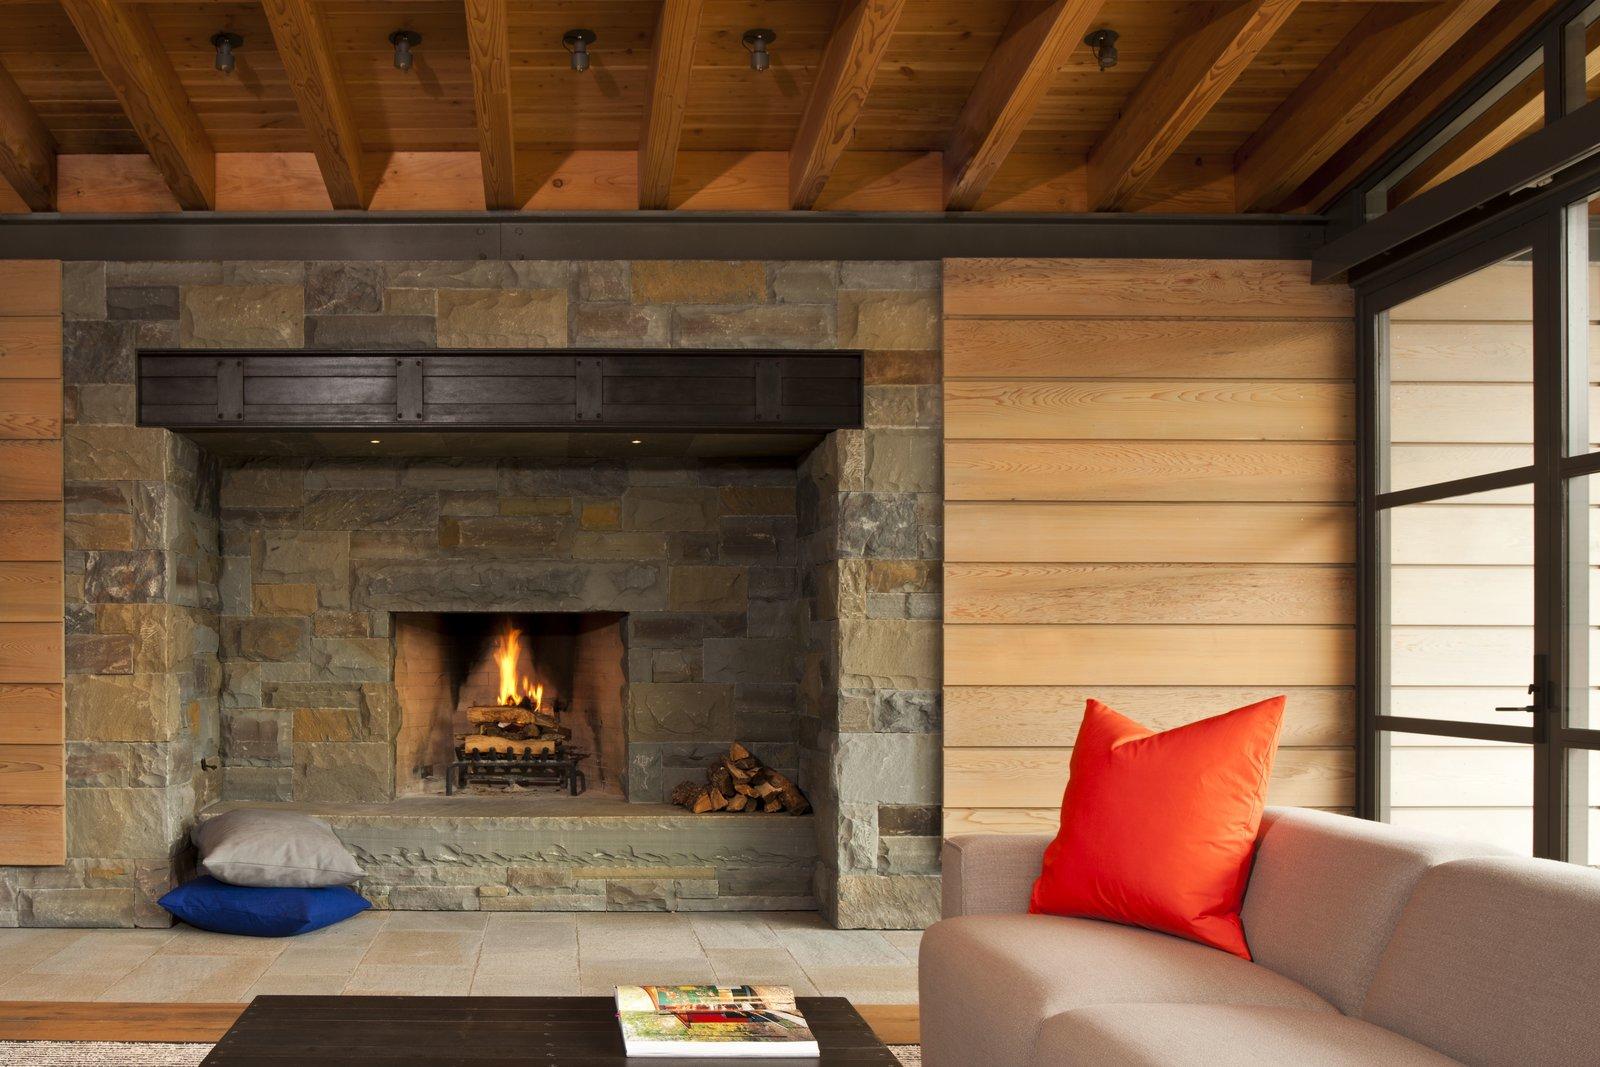 Tagged: Living Room, Wood Burning Fireplace, Coffee Tables, Light Hardwood Floor, and Sectional.  Halls Ridge Knoll by Bohlin Cywinski Jackson